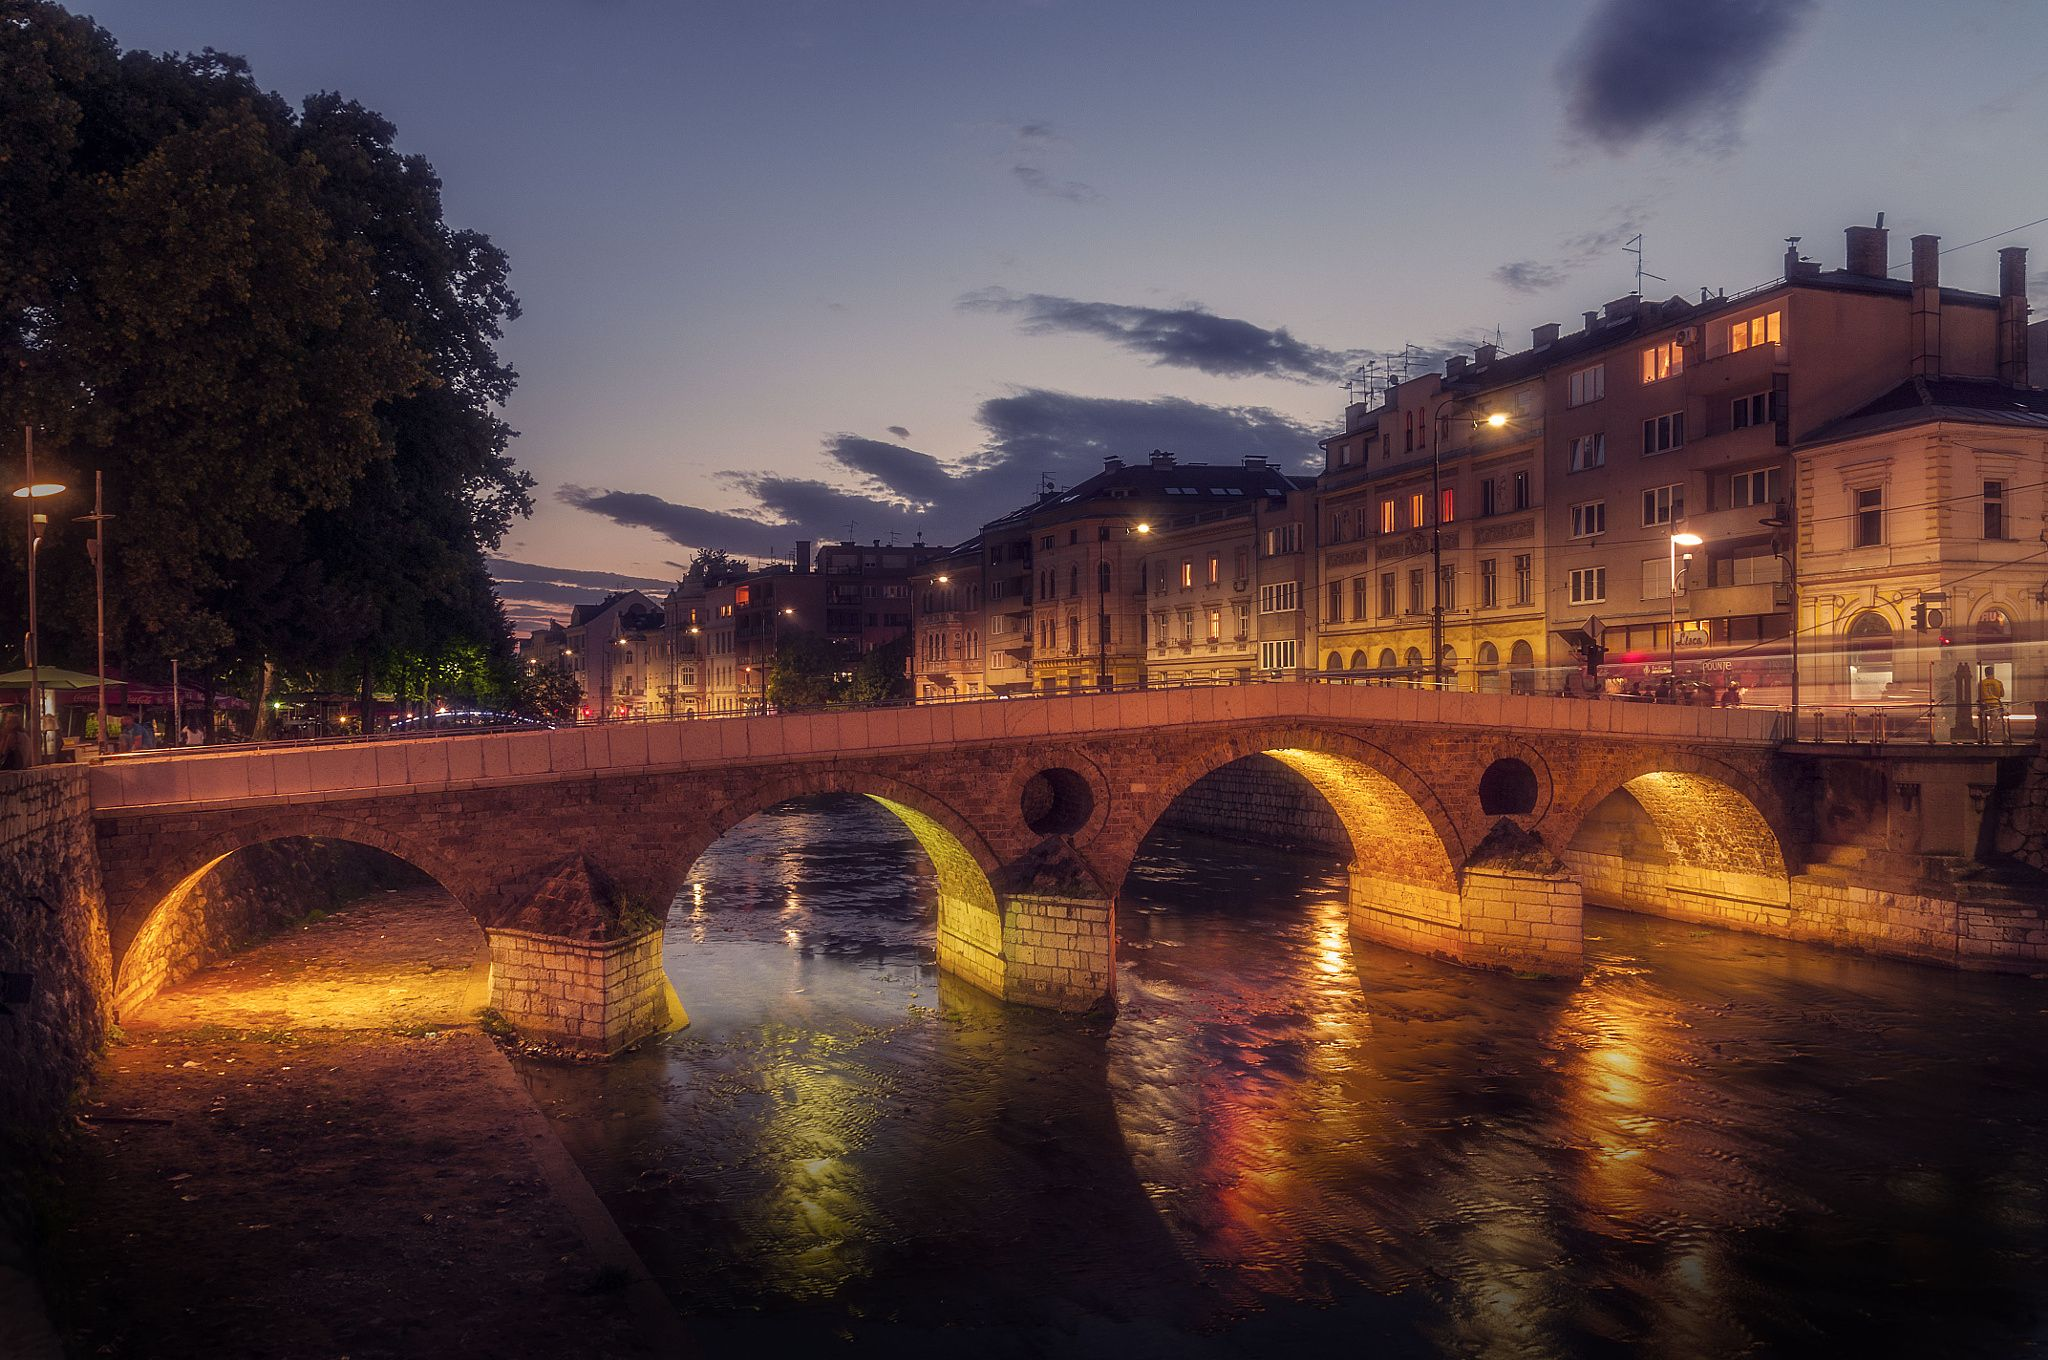 Latin Bridge by Emir Terovic on 500px